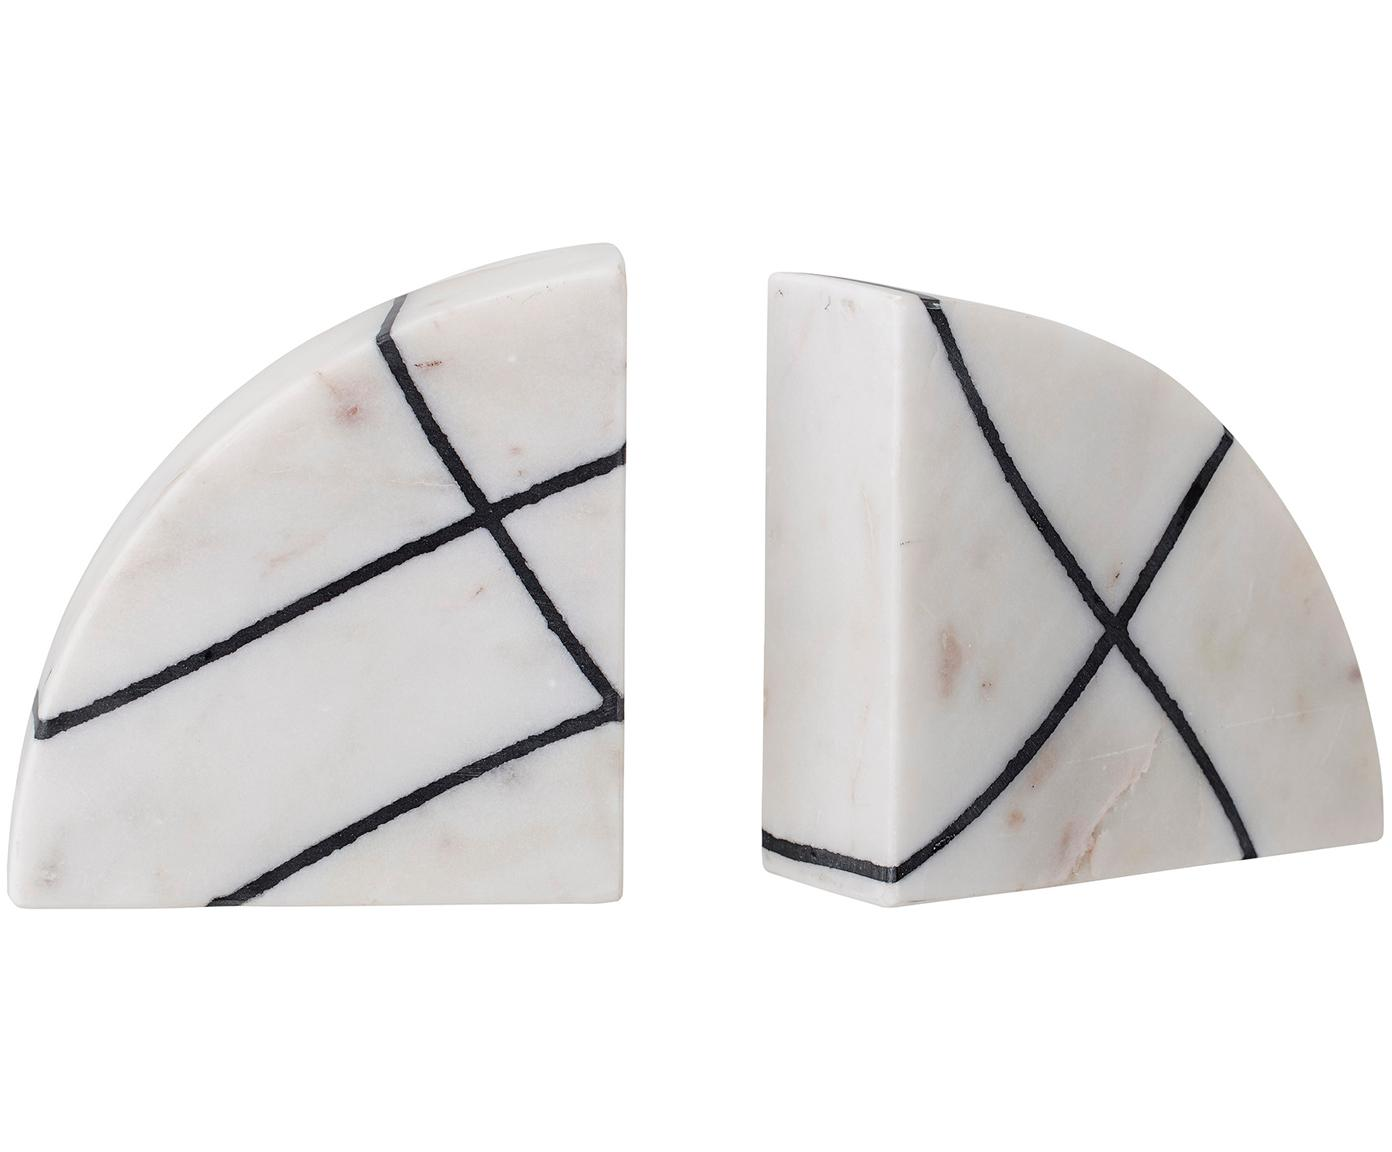 Marmeren boekensteunenset Whitey, 2-delig, Marmer, Wit, gemarmerd, zwart, 14 x 14 cm